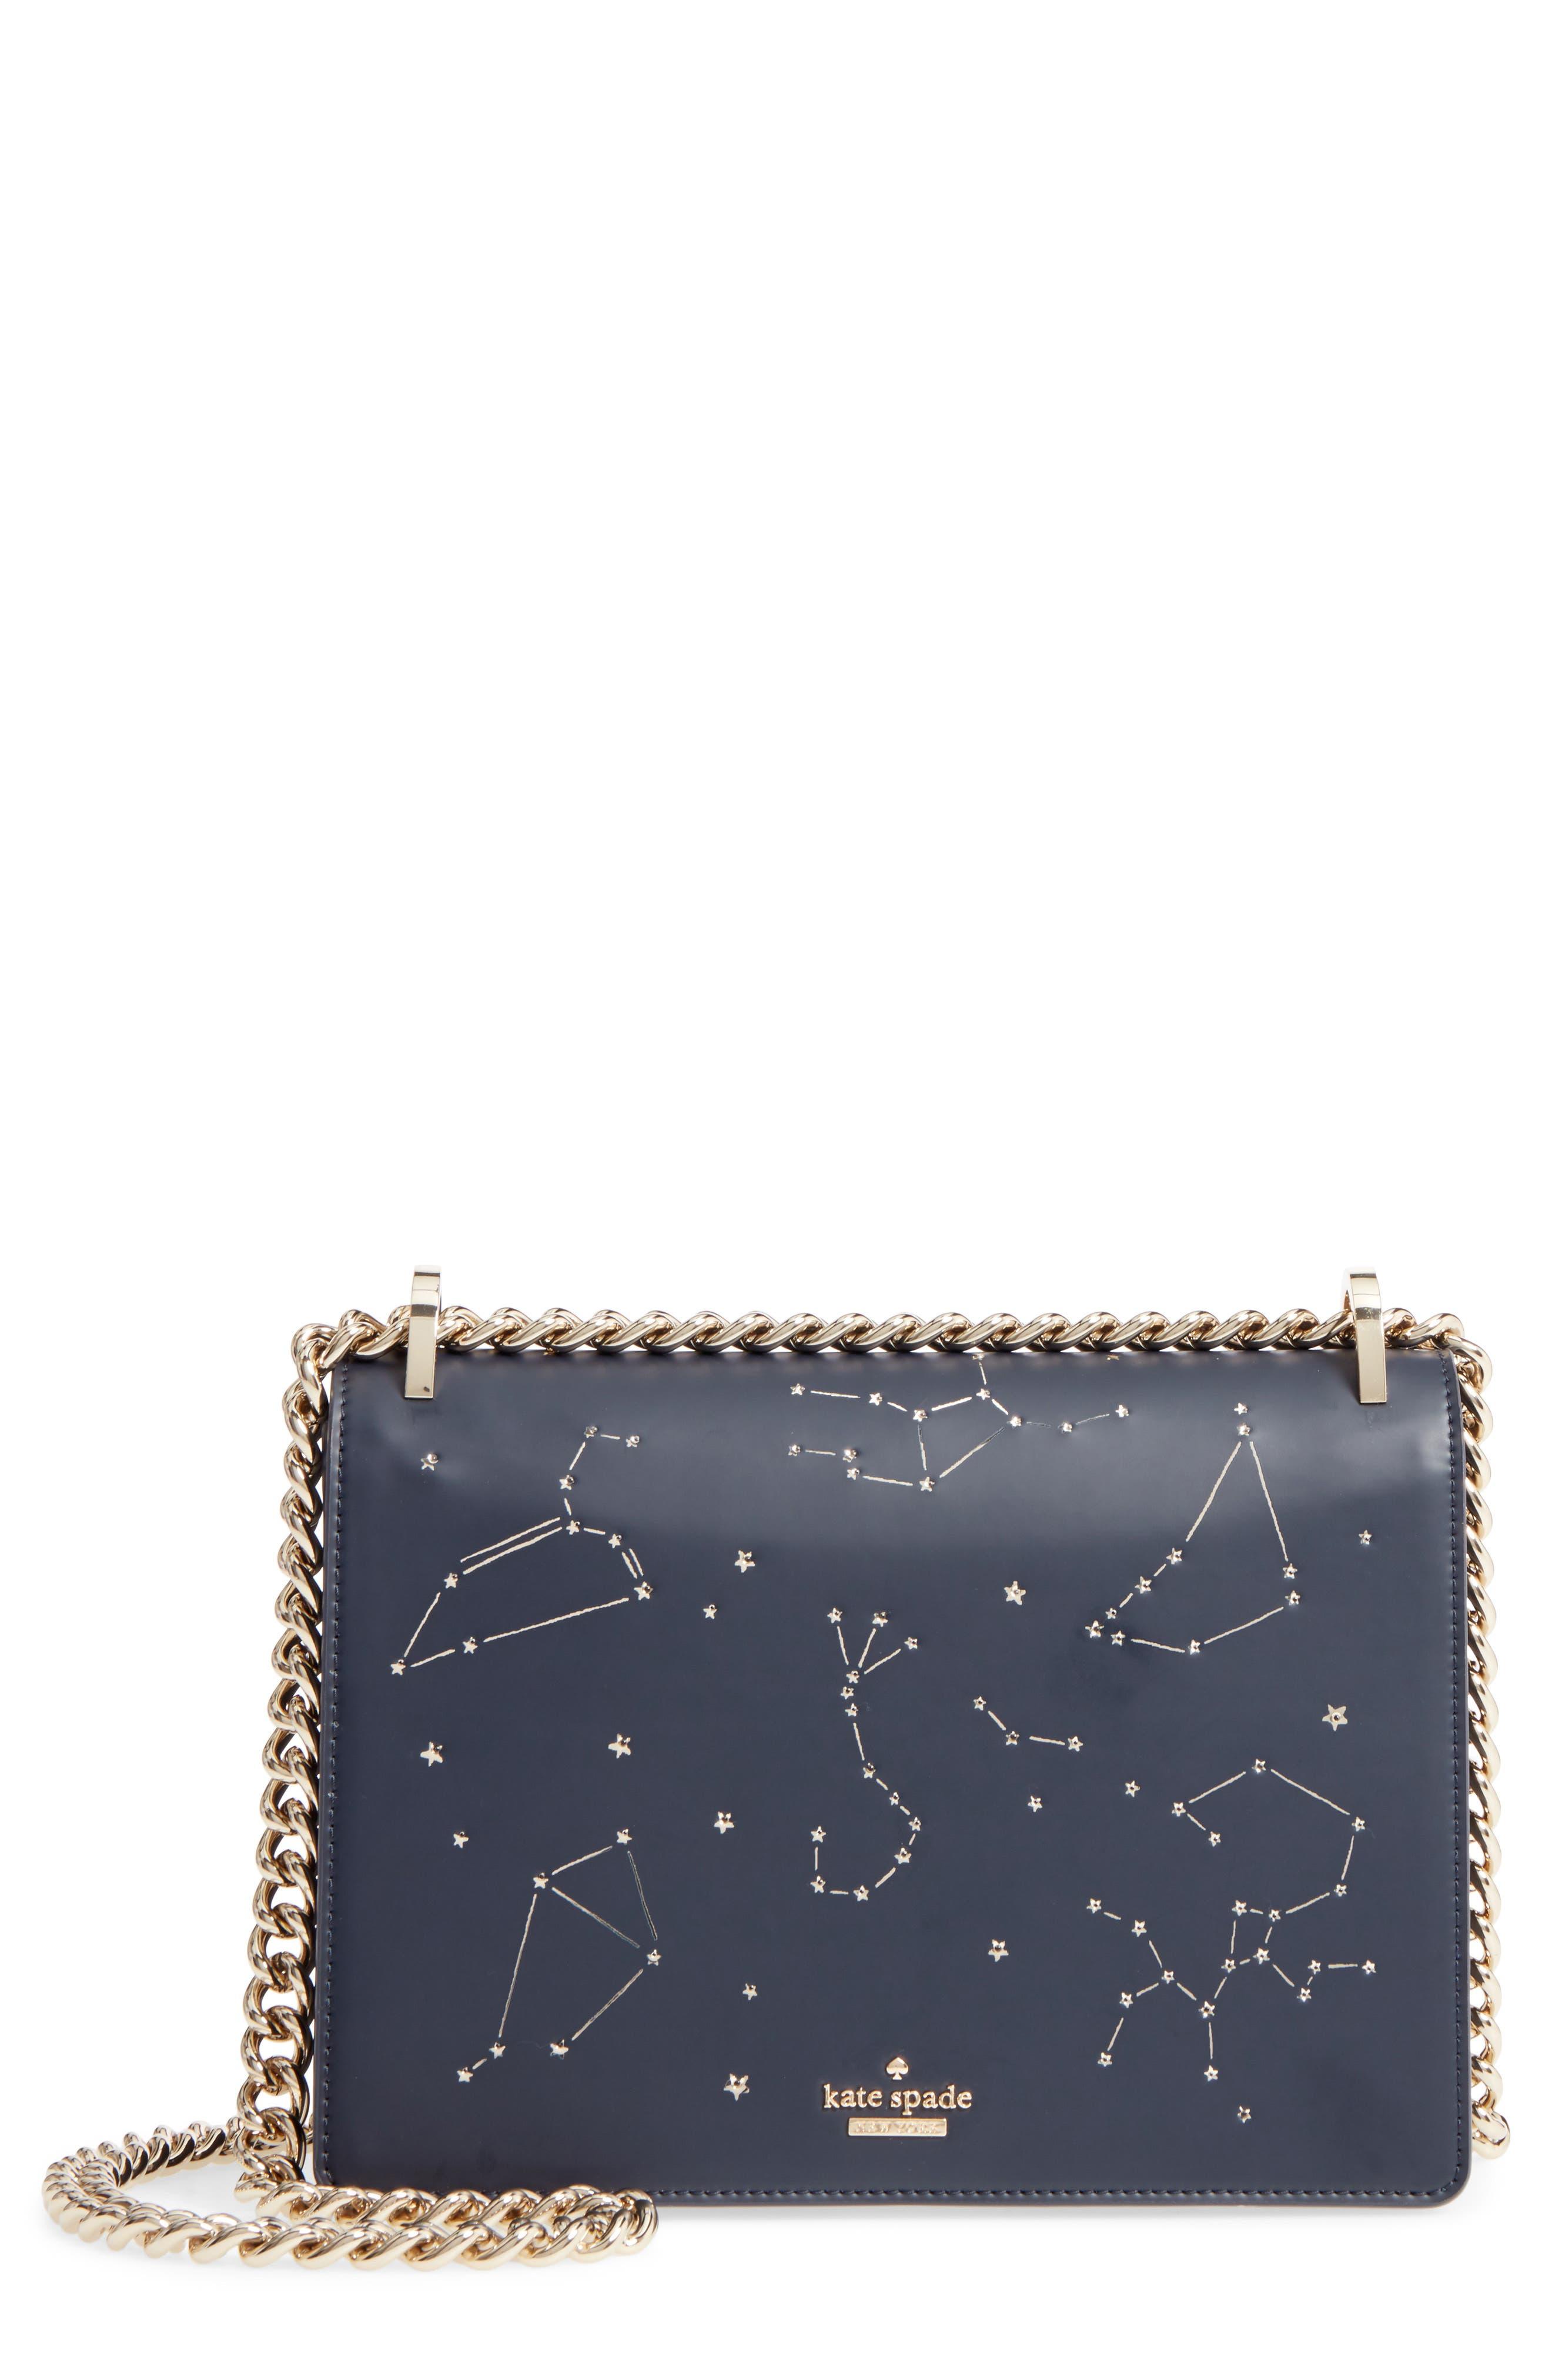 starbright marci LED light-up faux leather shoulder bag,                             Main thumbnail 1, color,                             400